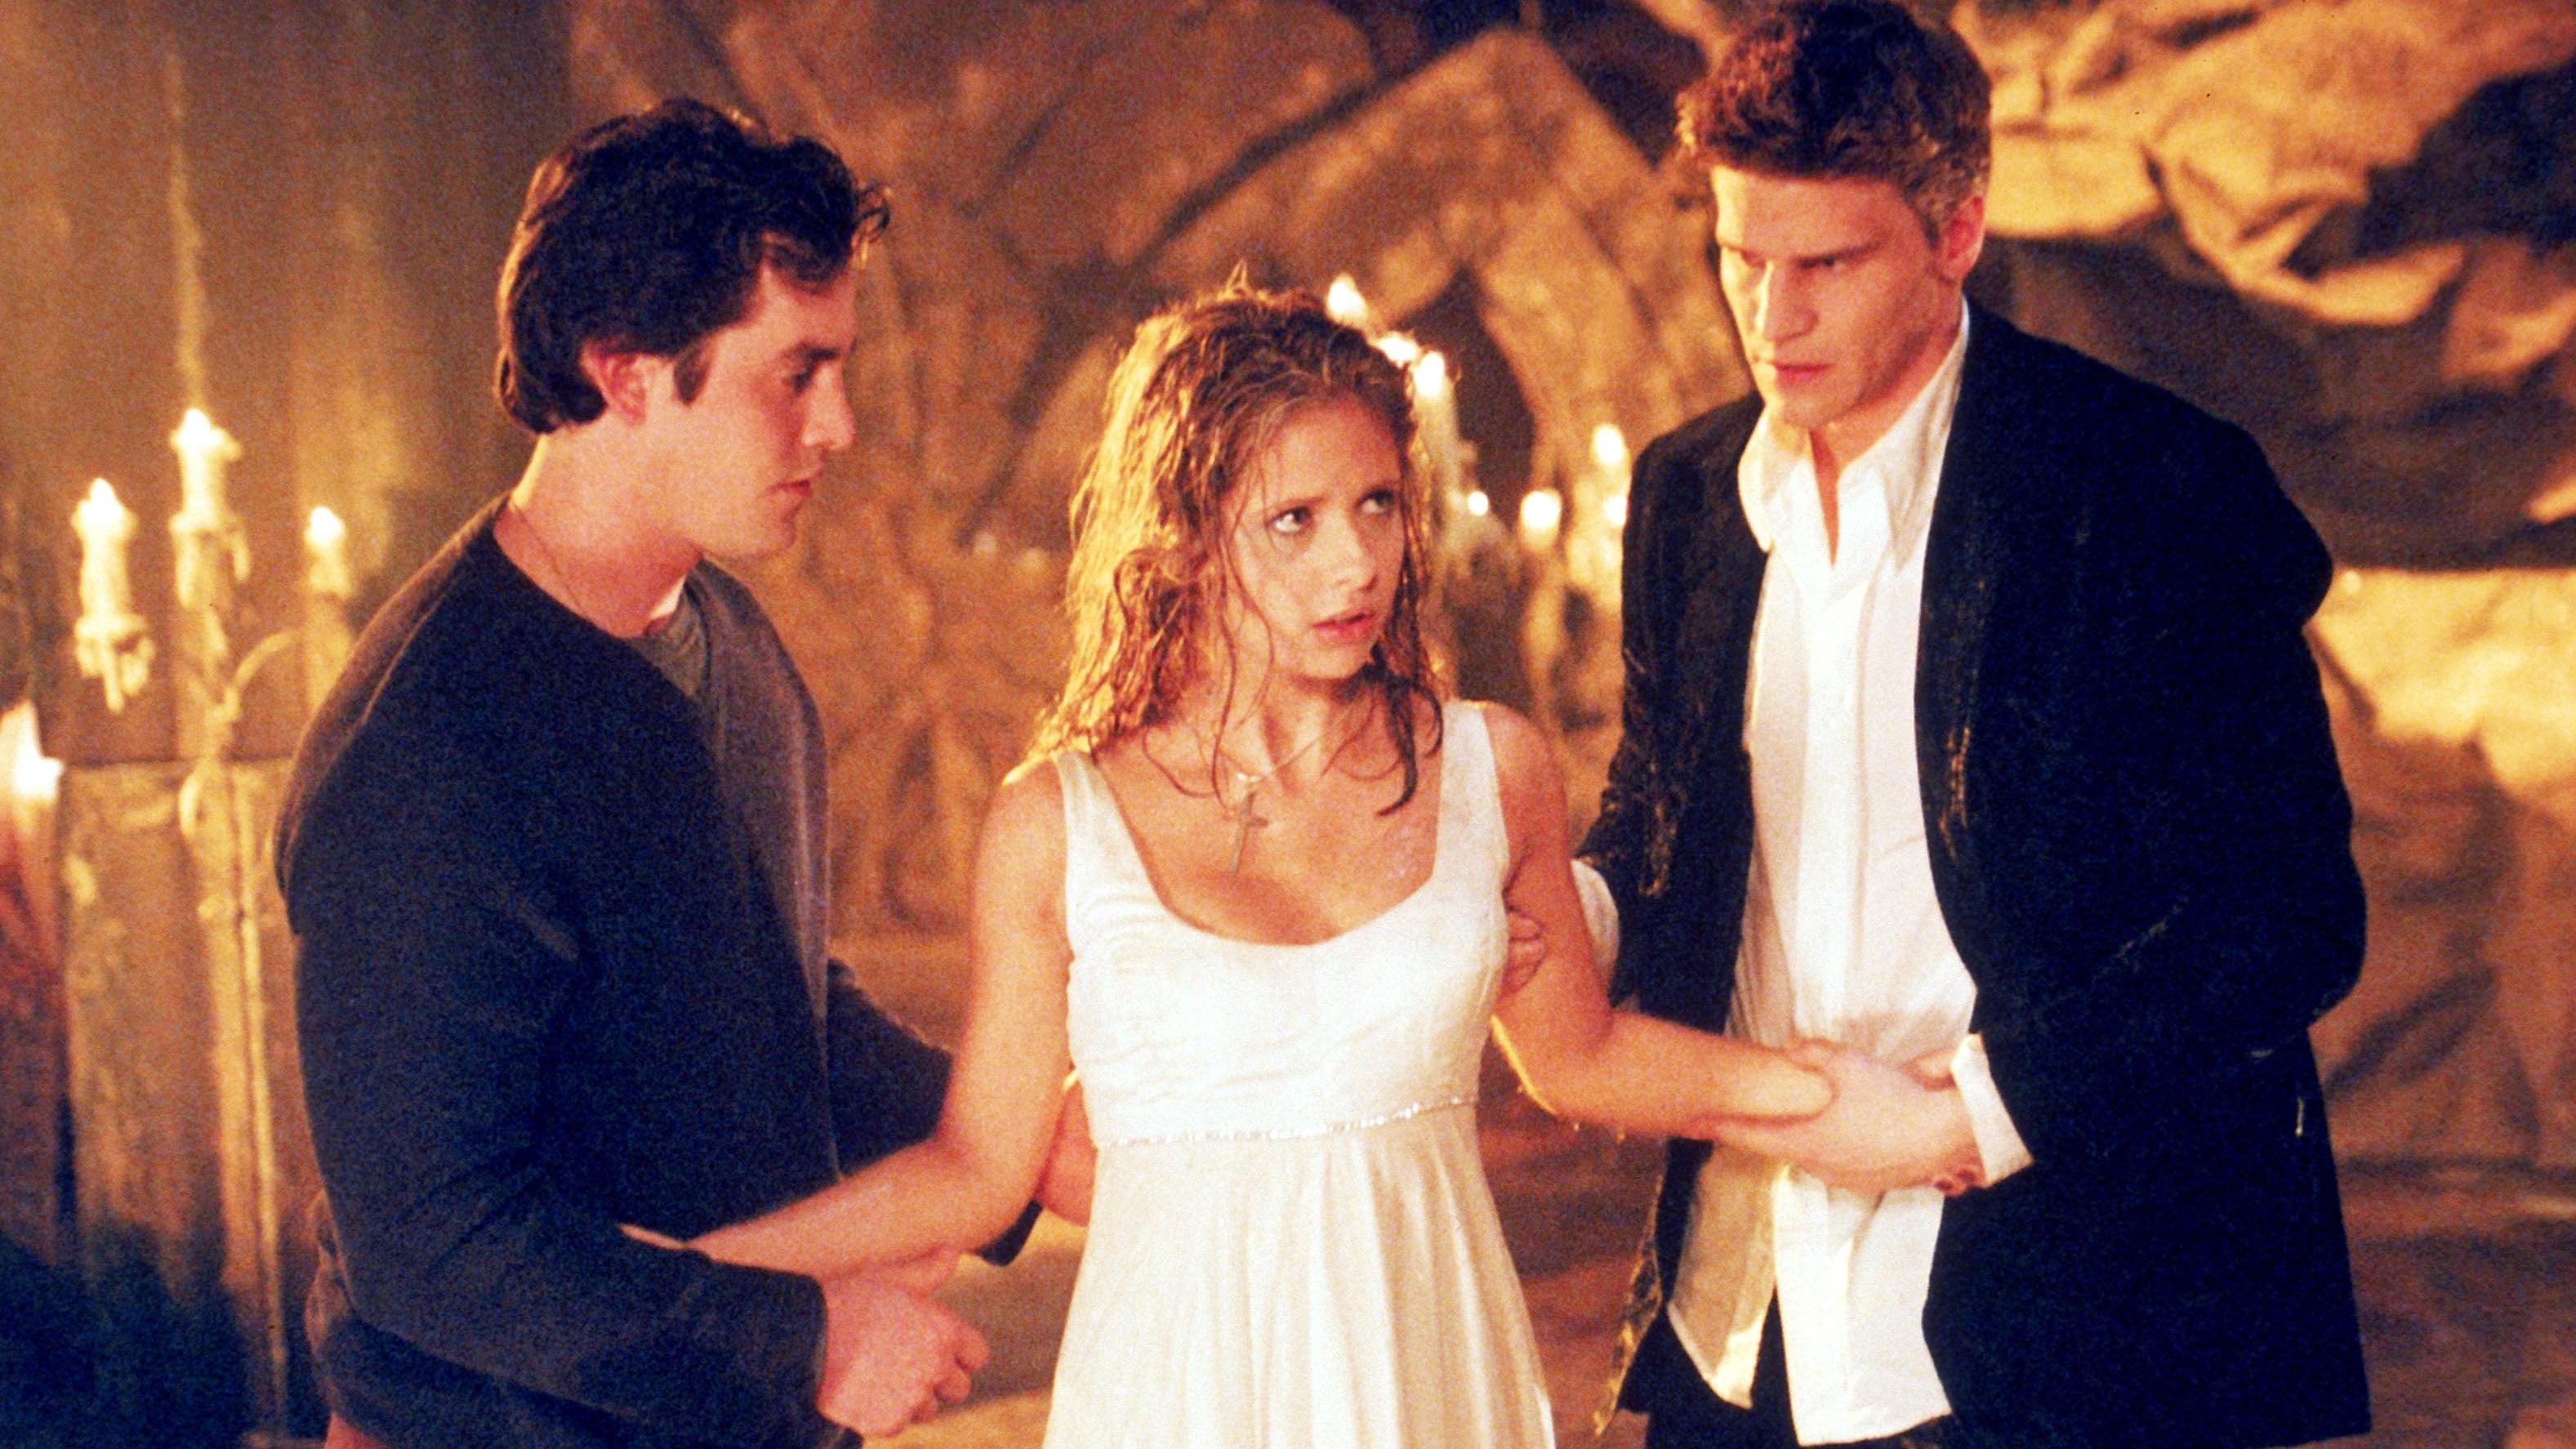 Buffy the slayer vampire - neomag.